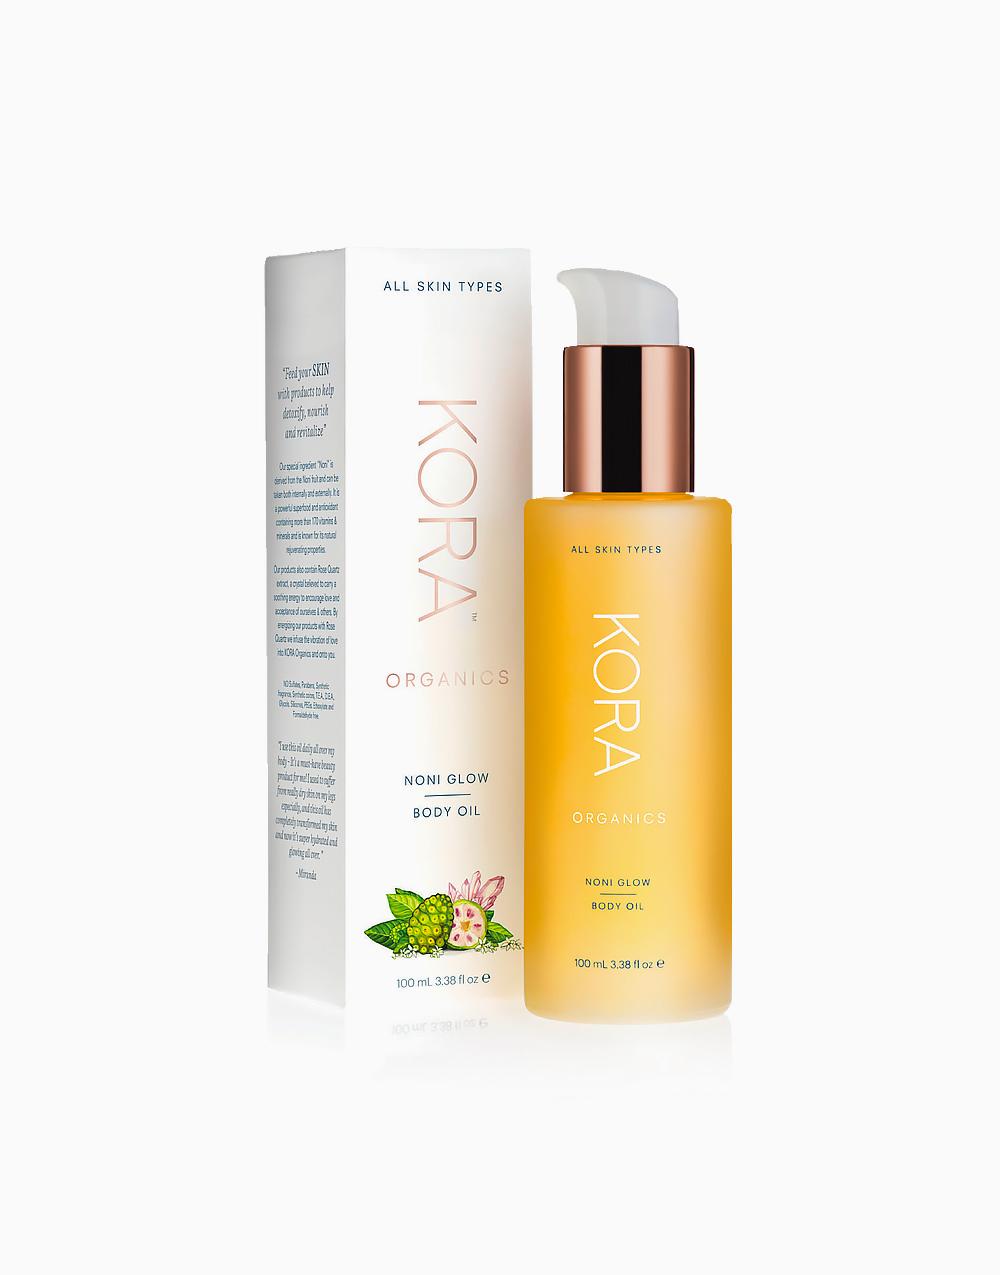 Noni Glow Body Oil (100ml) by Kora Organics